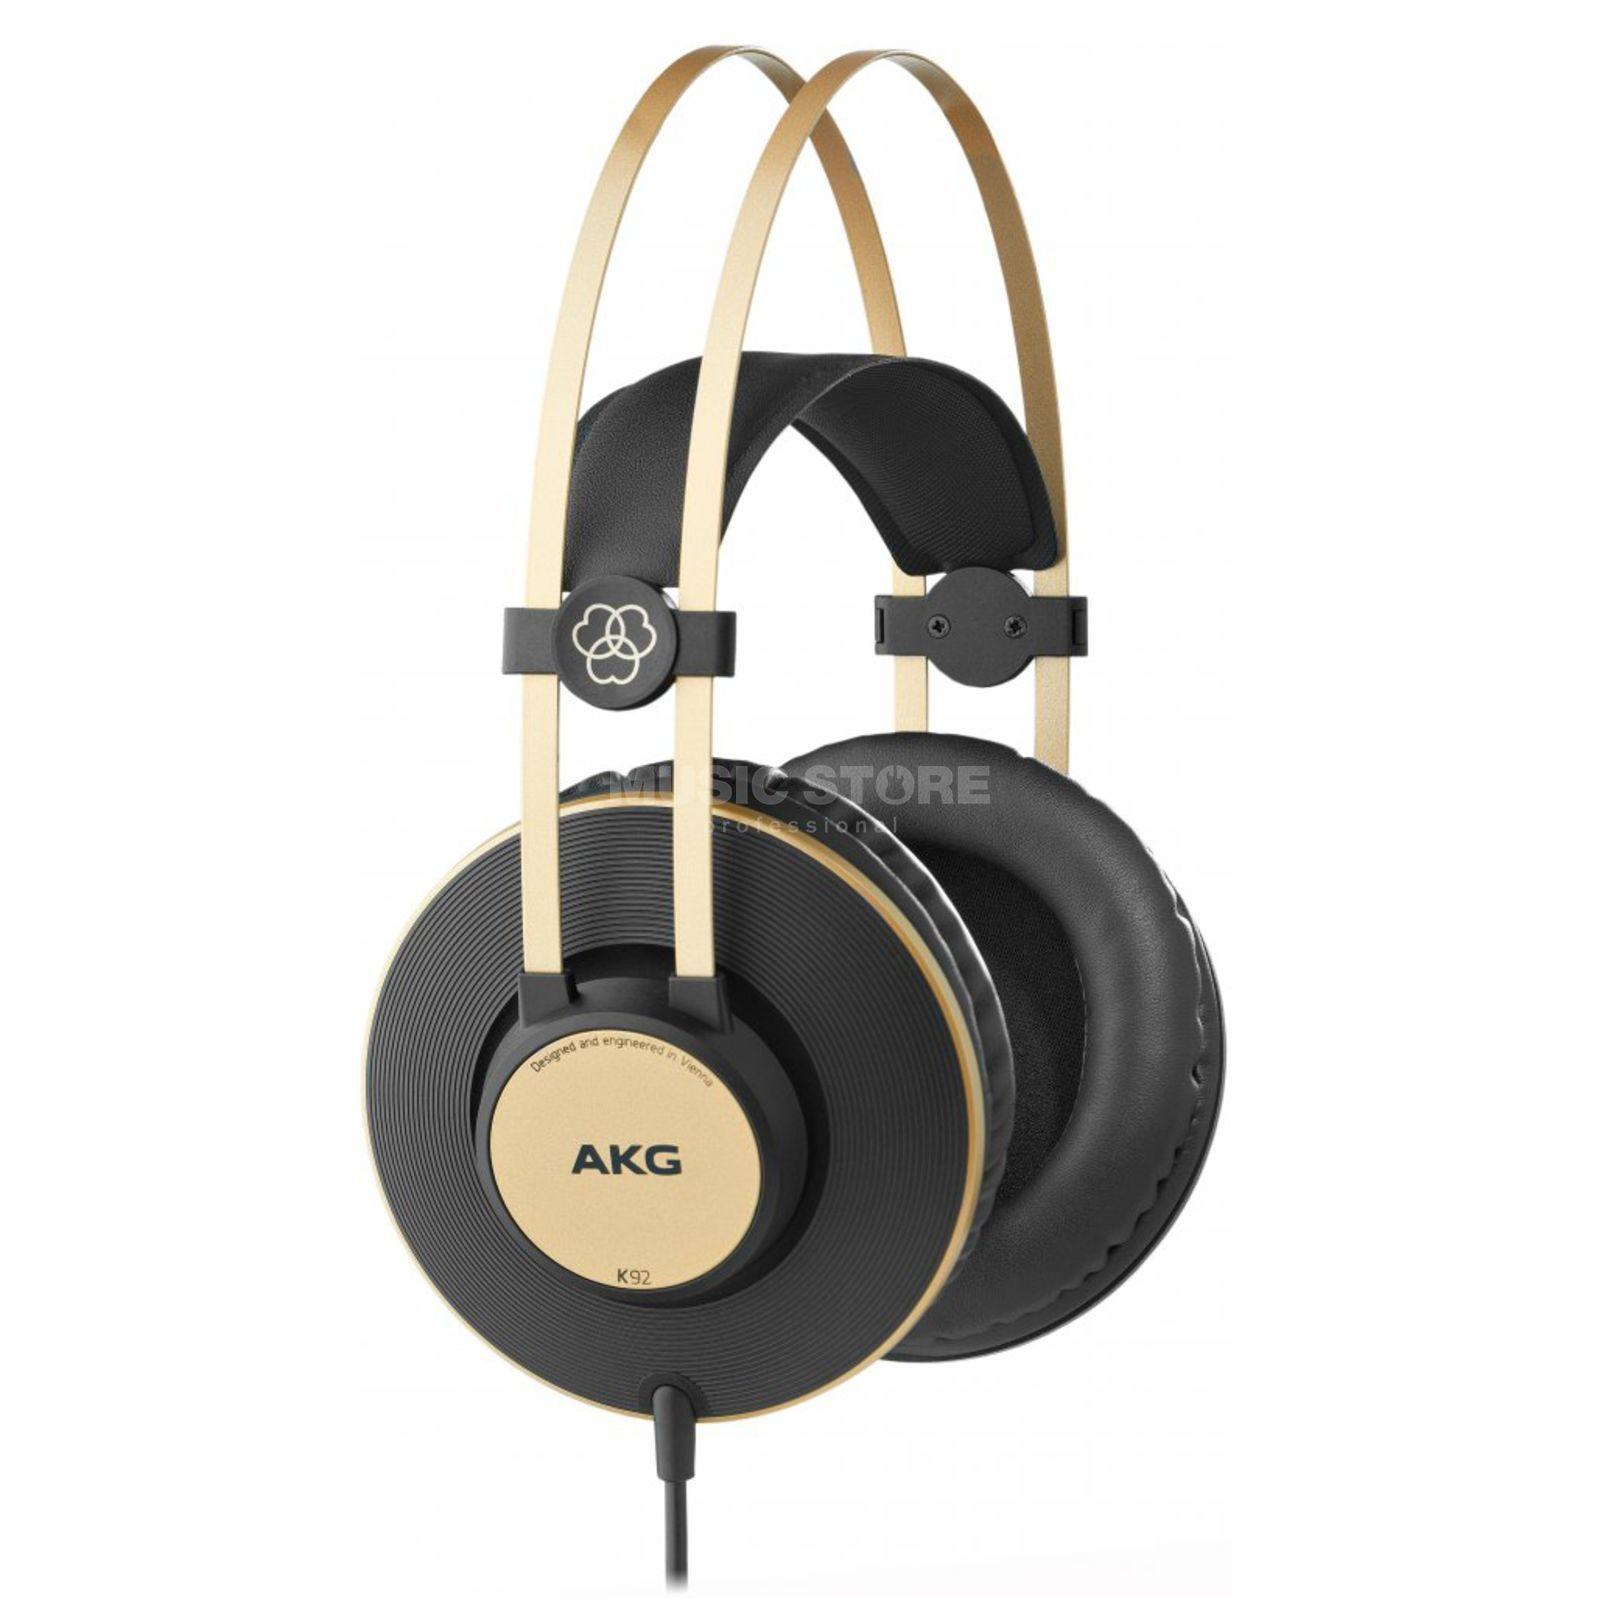 AKG K92 Closed-Back Headphones - £35.50 @ DV247